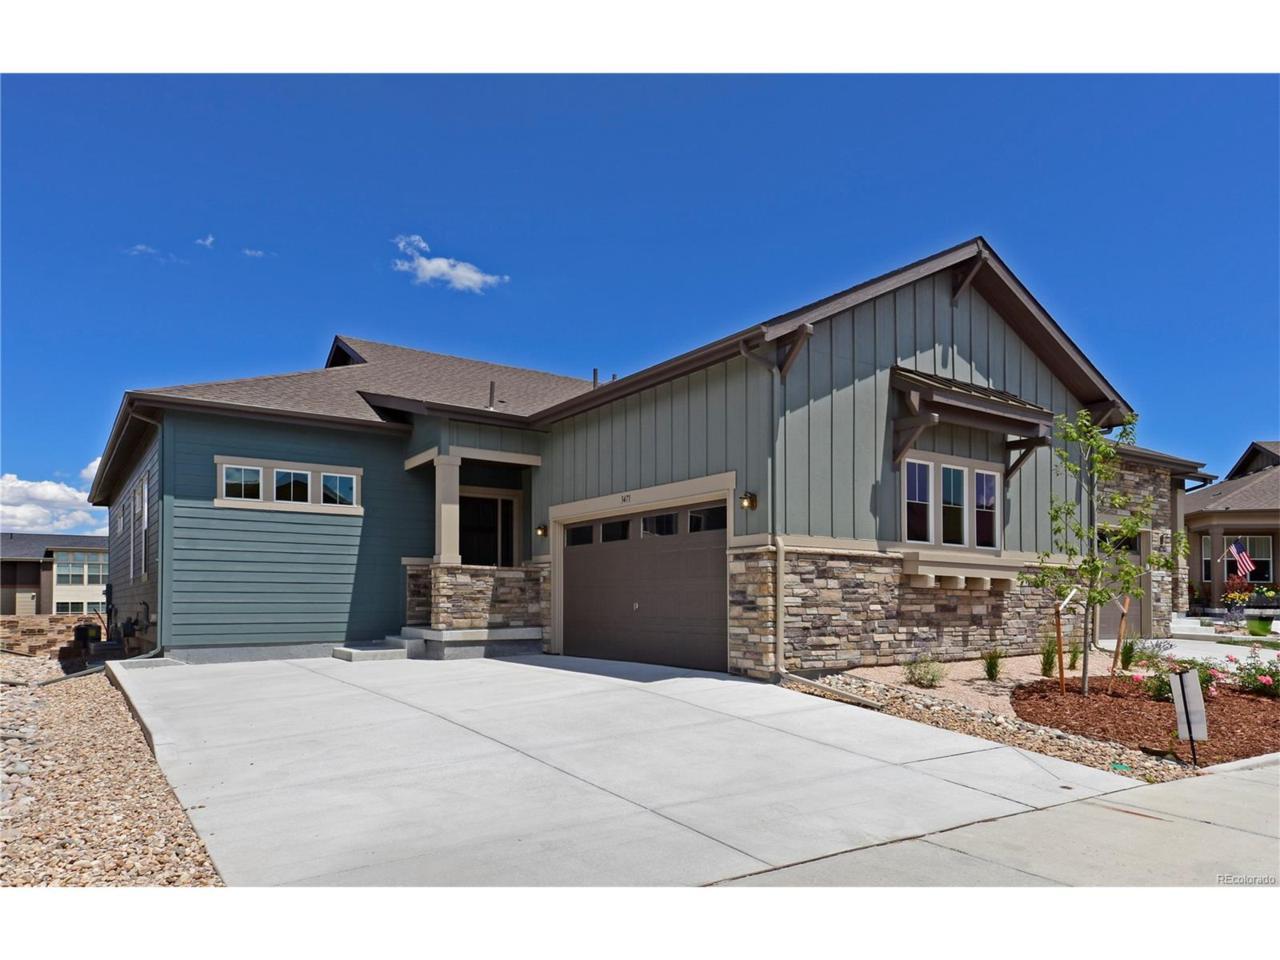 3471 New Haven Circle, Castle Rock, CO 80109 (MLS #9598765) :: 8z Real Estate